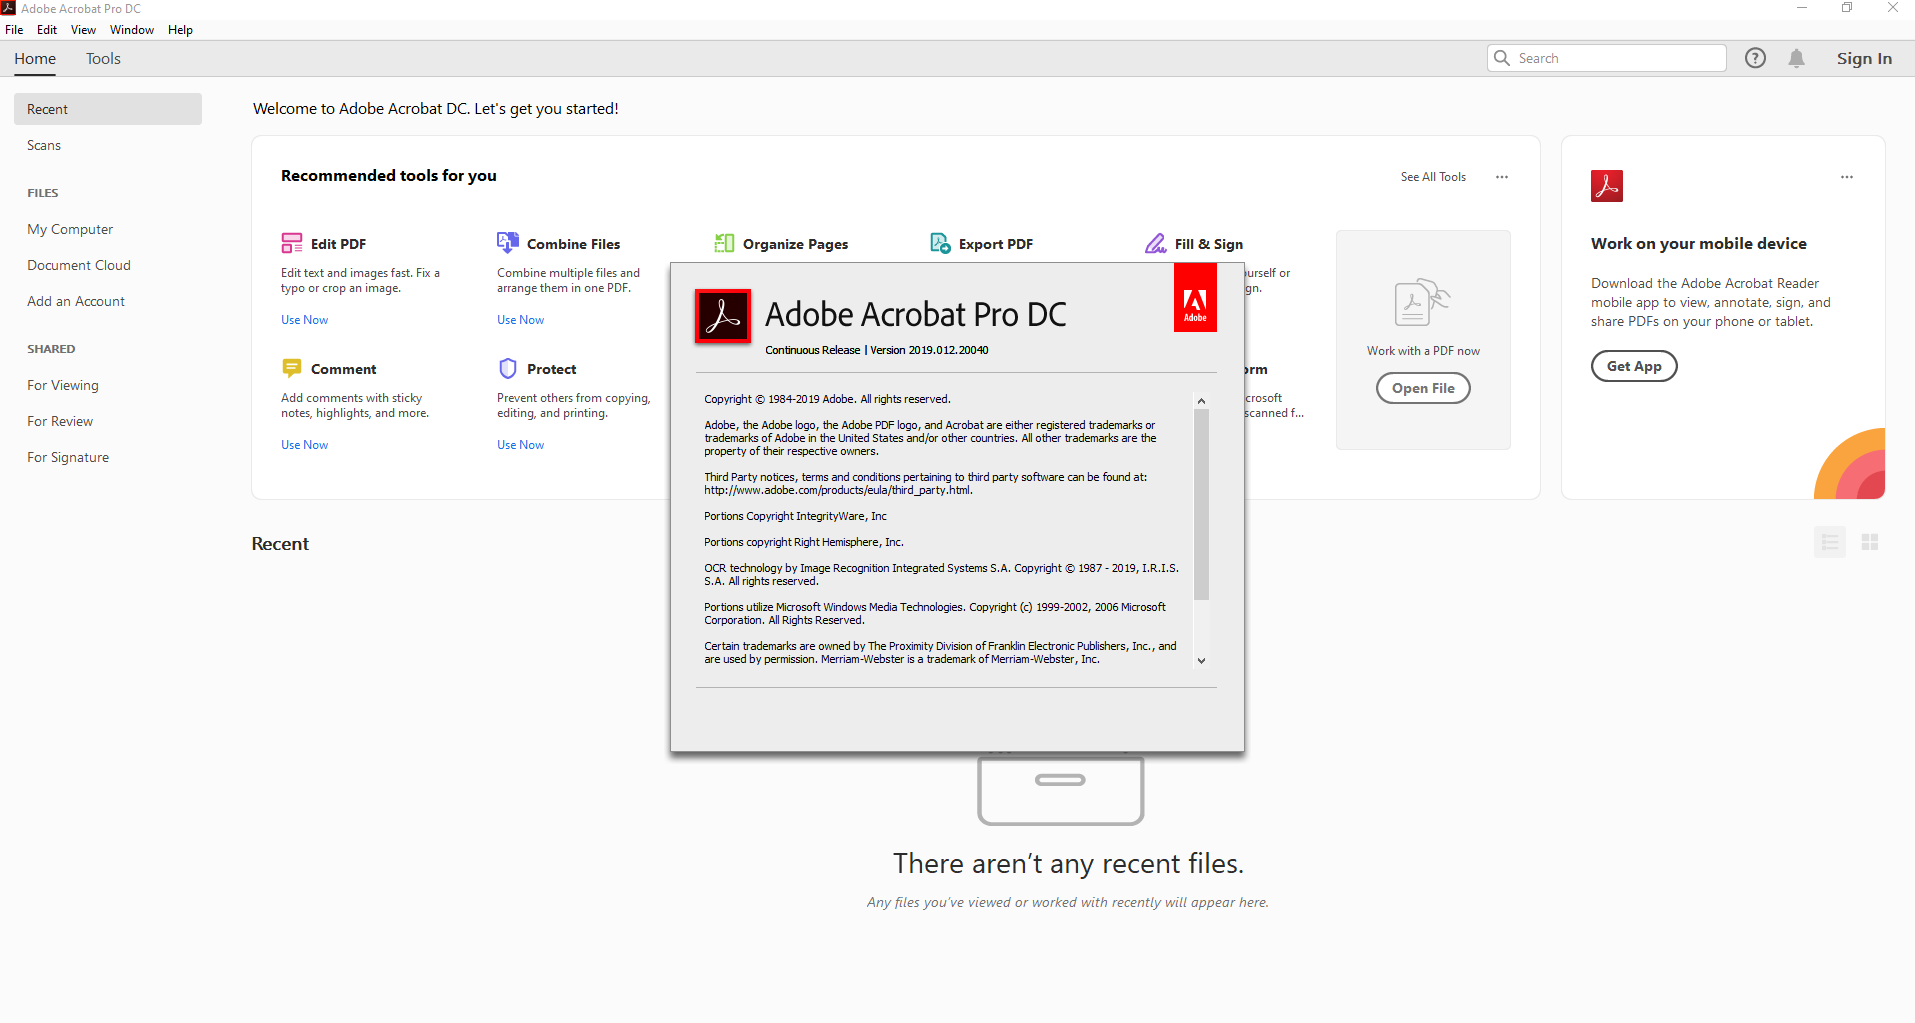 Adobe Acrobat Pro DC 2019 012 20040 - Software Updates